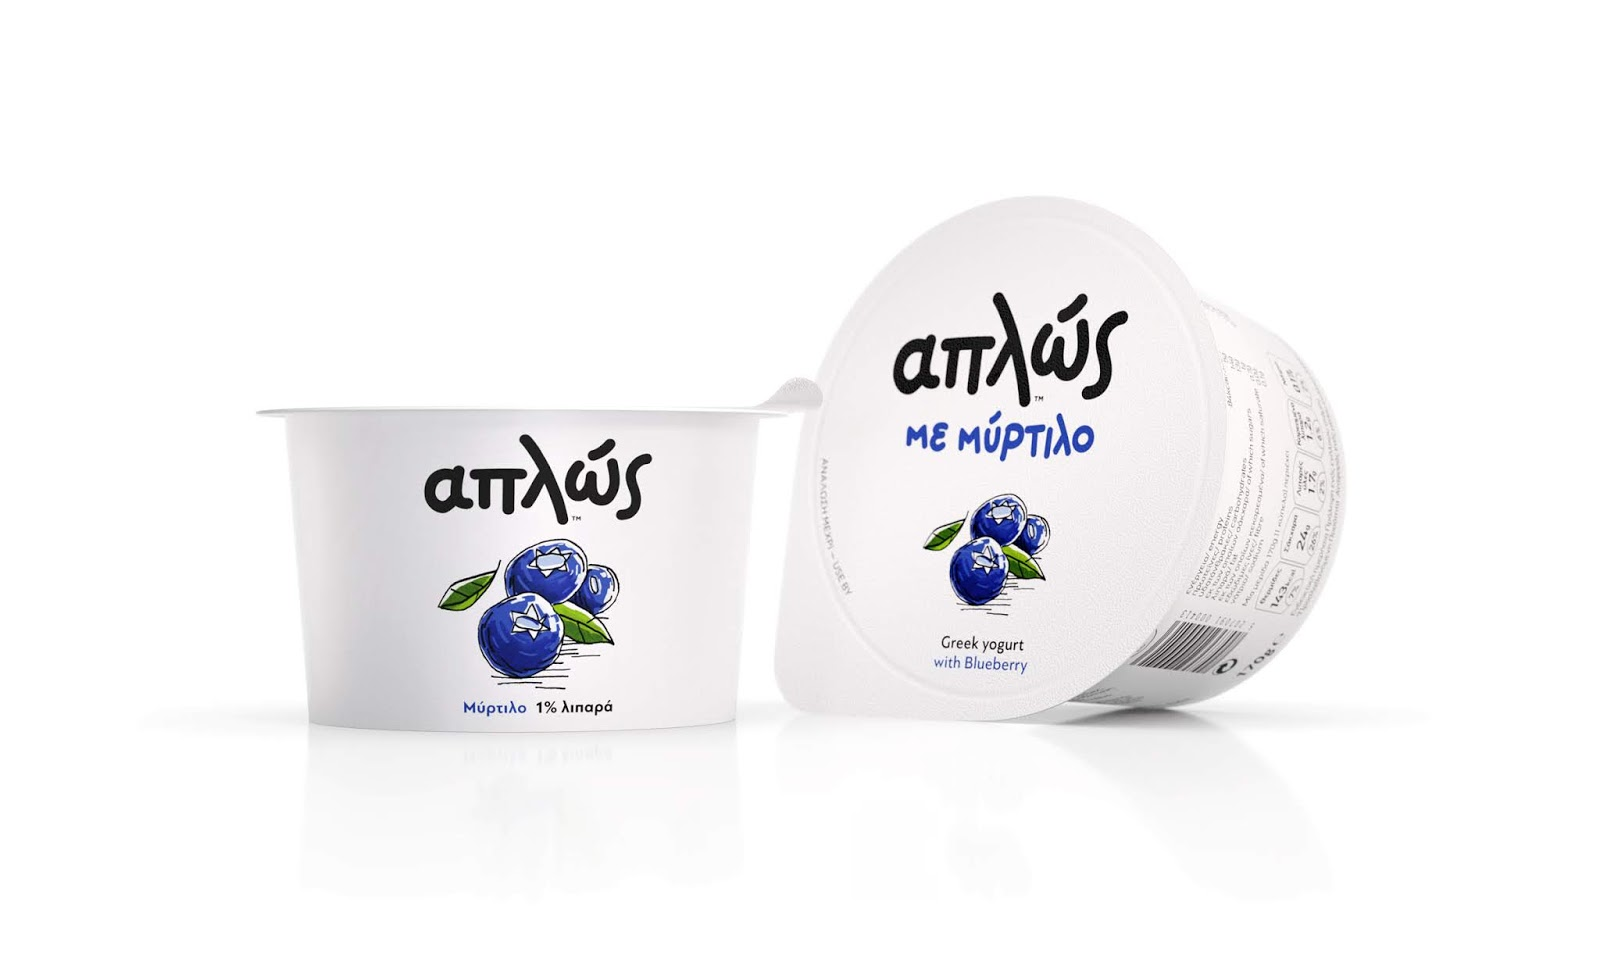 Aplos希腊酸奶包装设计